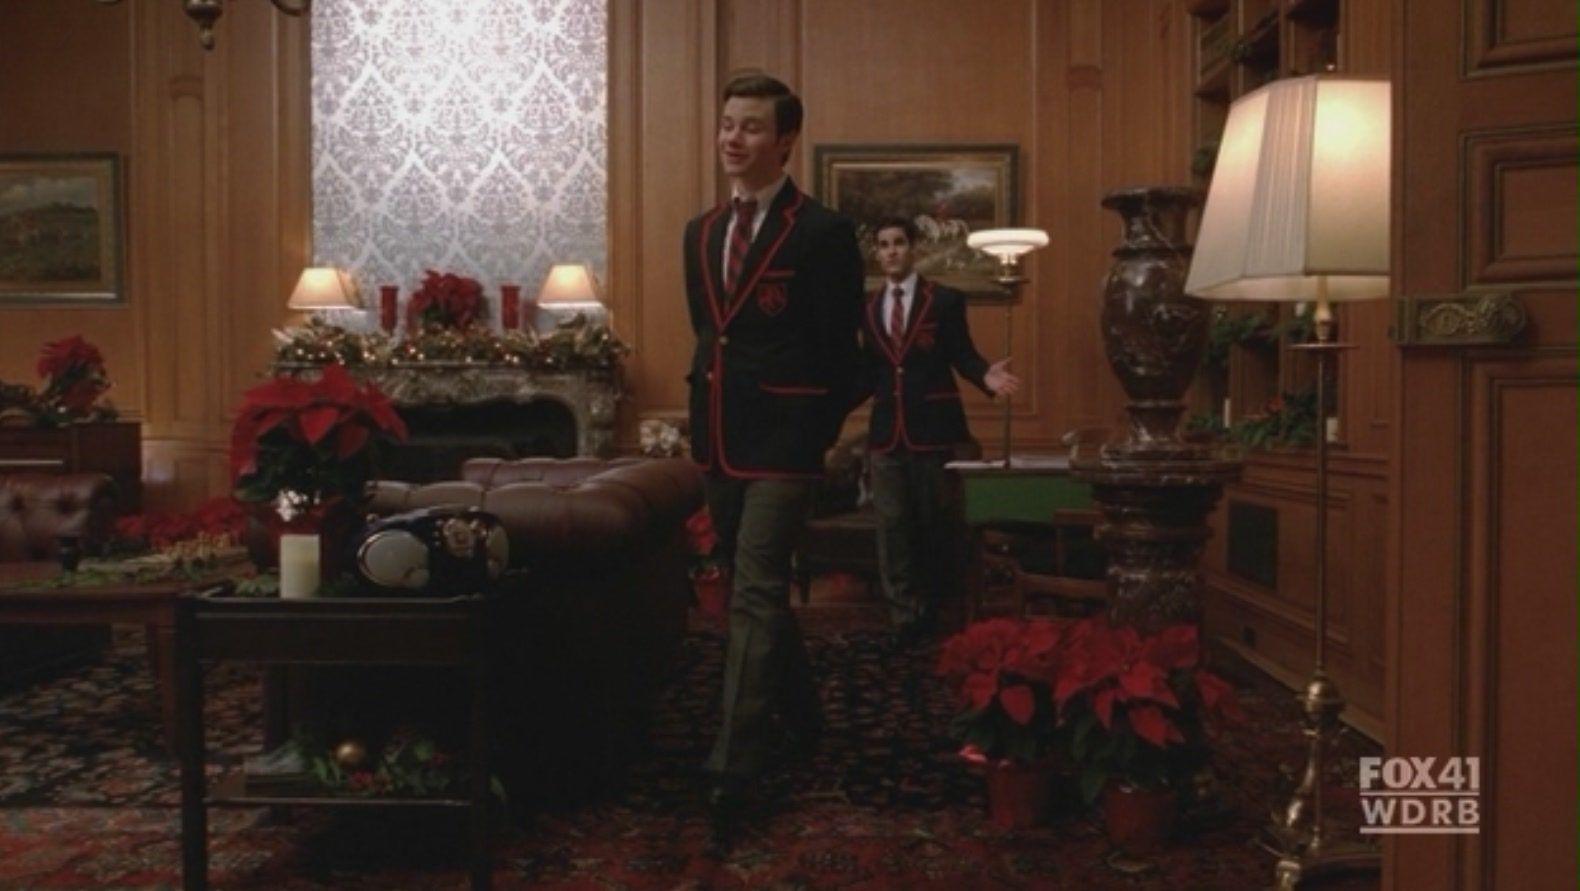 Sala de Reunioes dos Warblers (Rouxinois) Klaine-2x10-A-Very-Glee-Christmas-kurt-and-blaine-17533570-1580-891